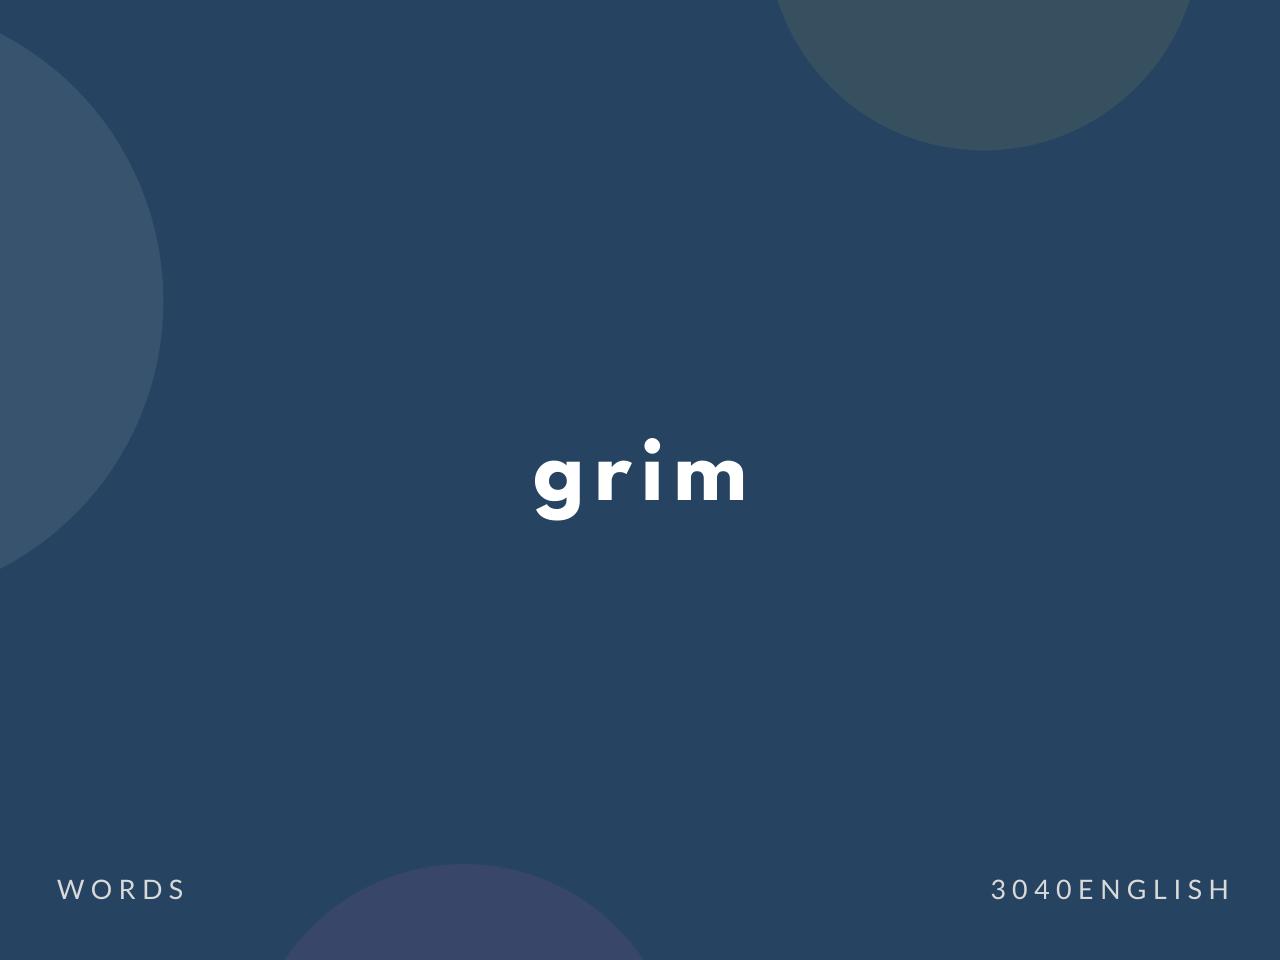 grim の意味と簡単な使い方【音読用例文あり】